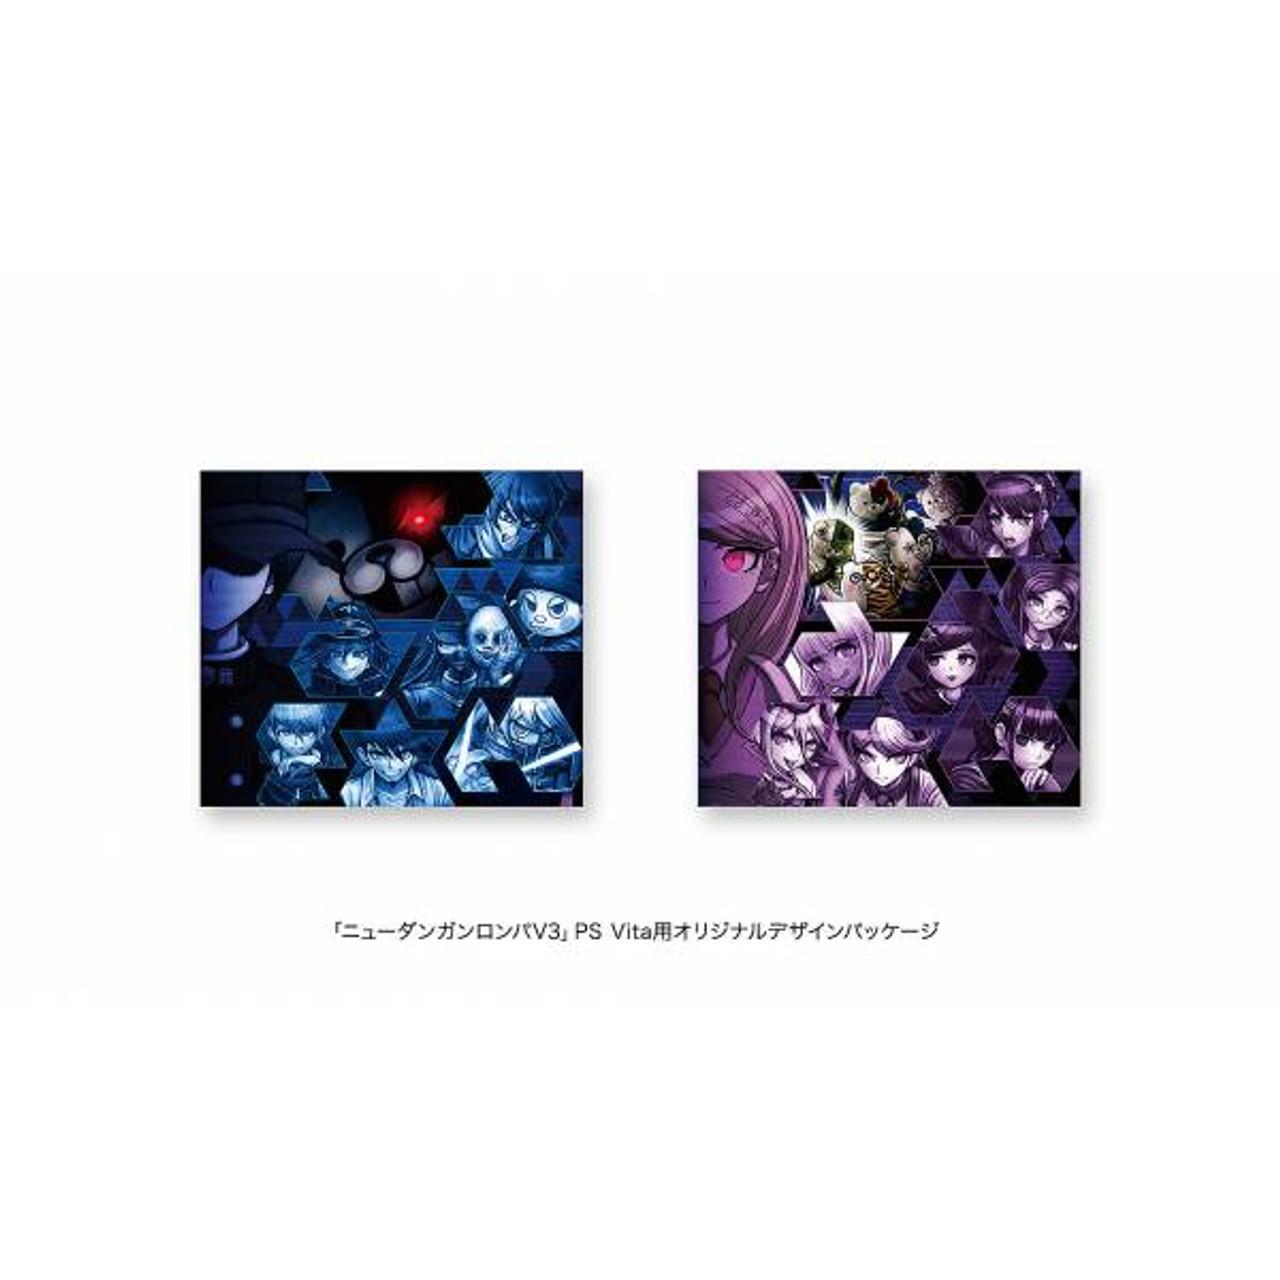 PlayStation Vita Slim DANGANRONPA V3 GLACIER WHITE LIMITED EDITION [JAPAN]